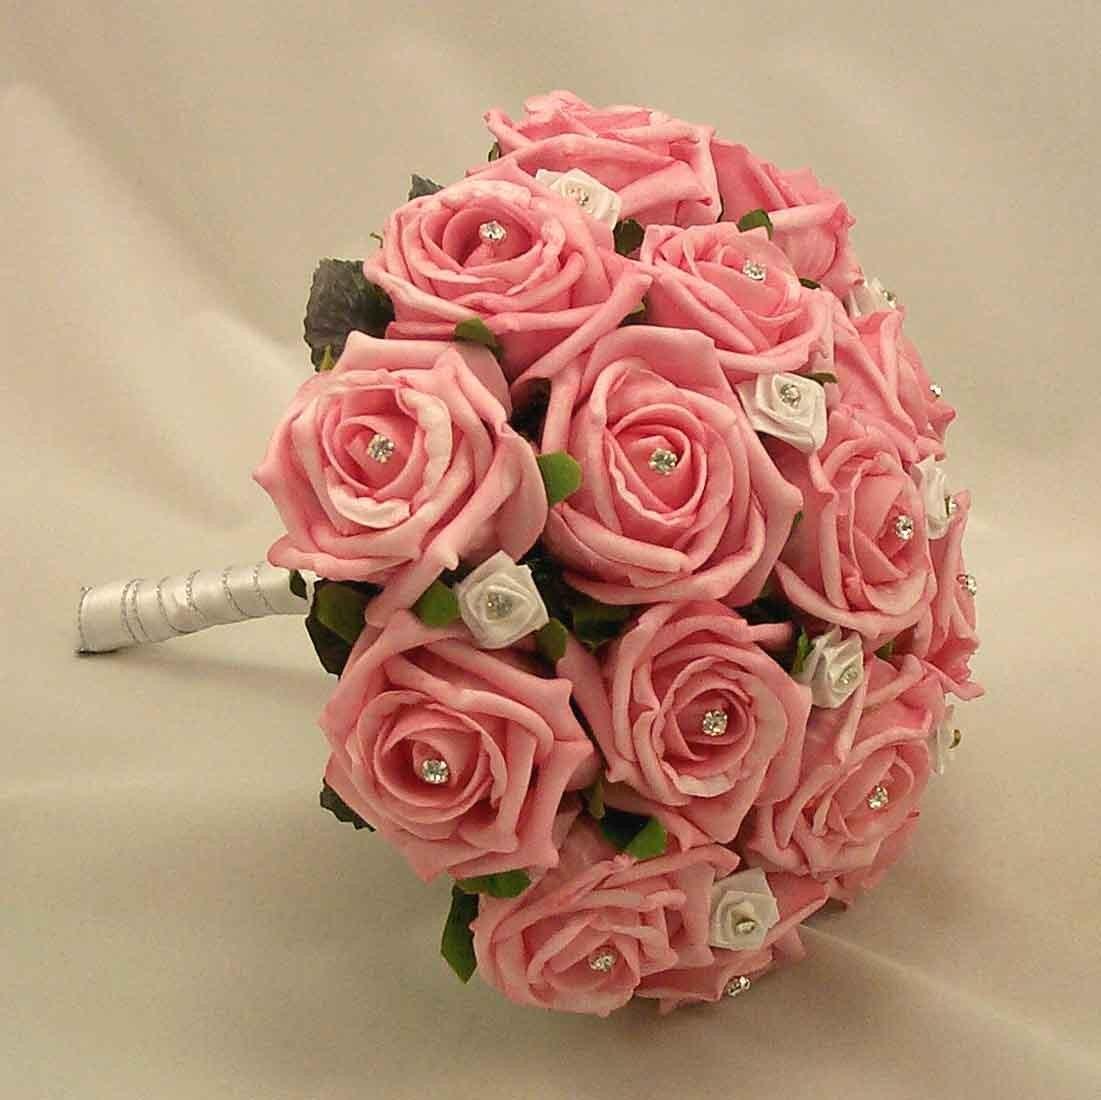 Bridal Bouquets Pink Rose Diamante Posy Bouquet Silk Wedding Flowers